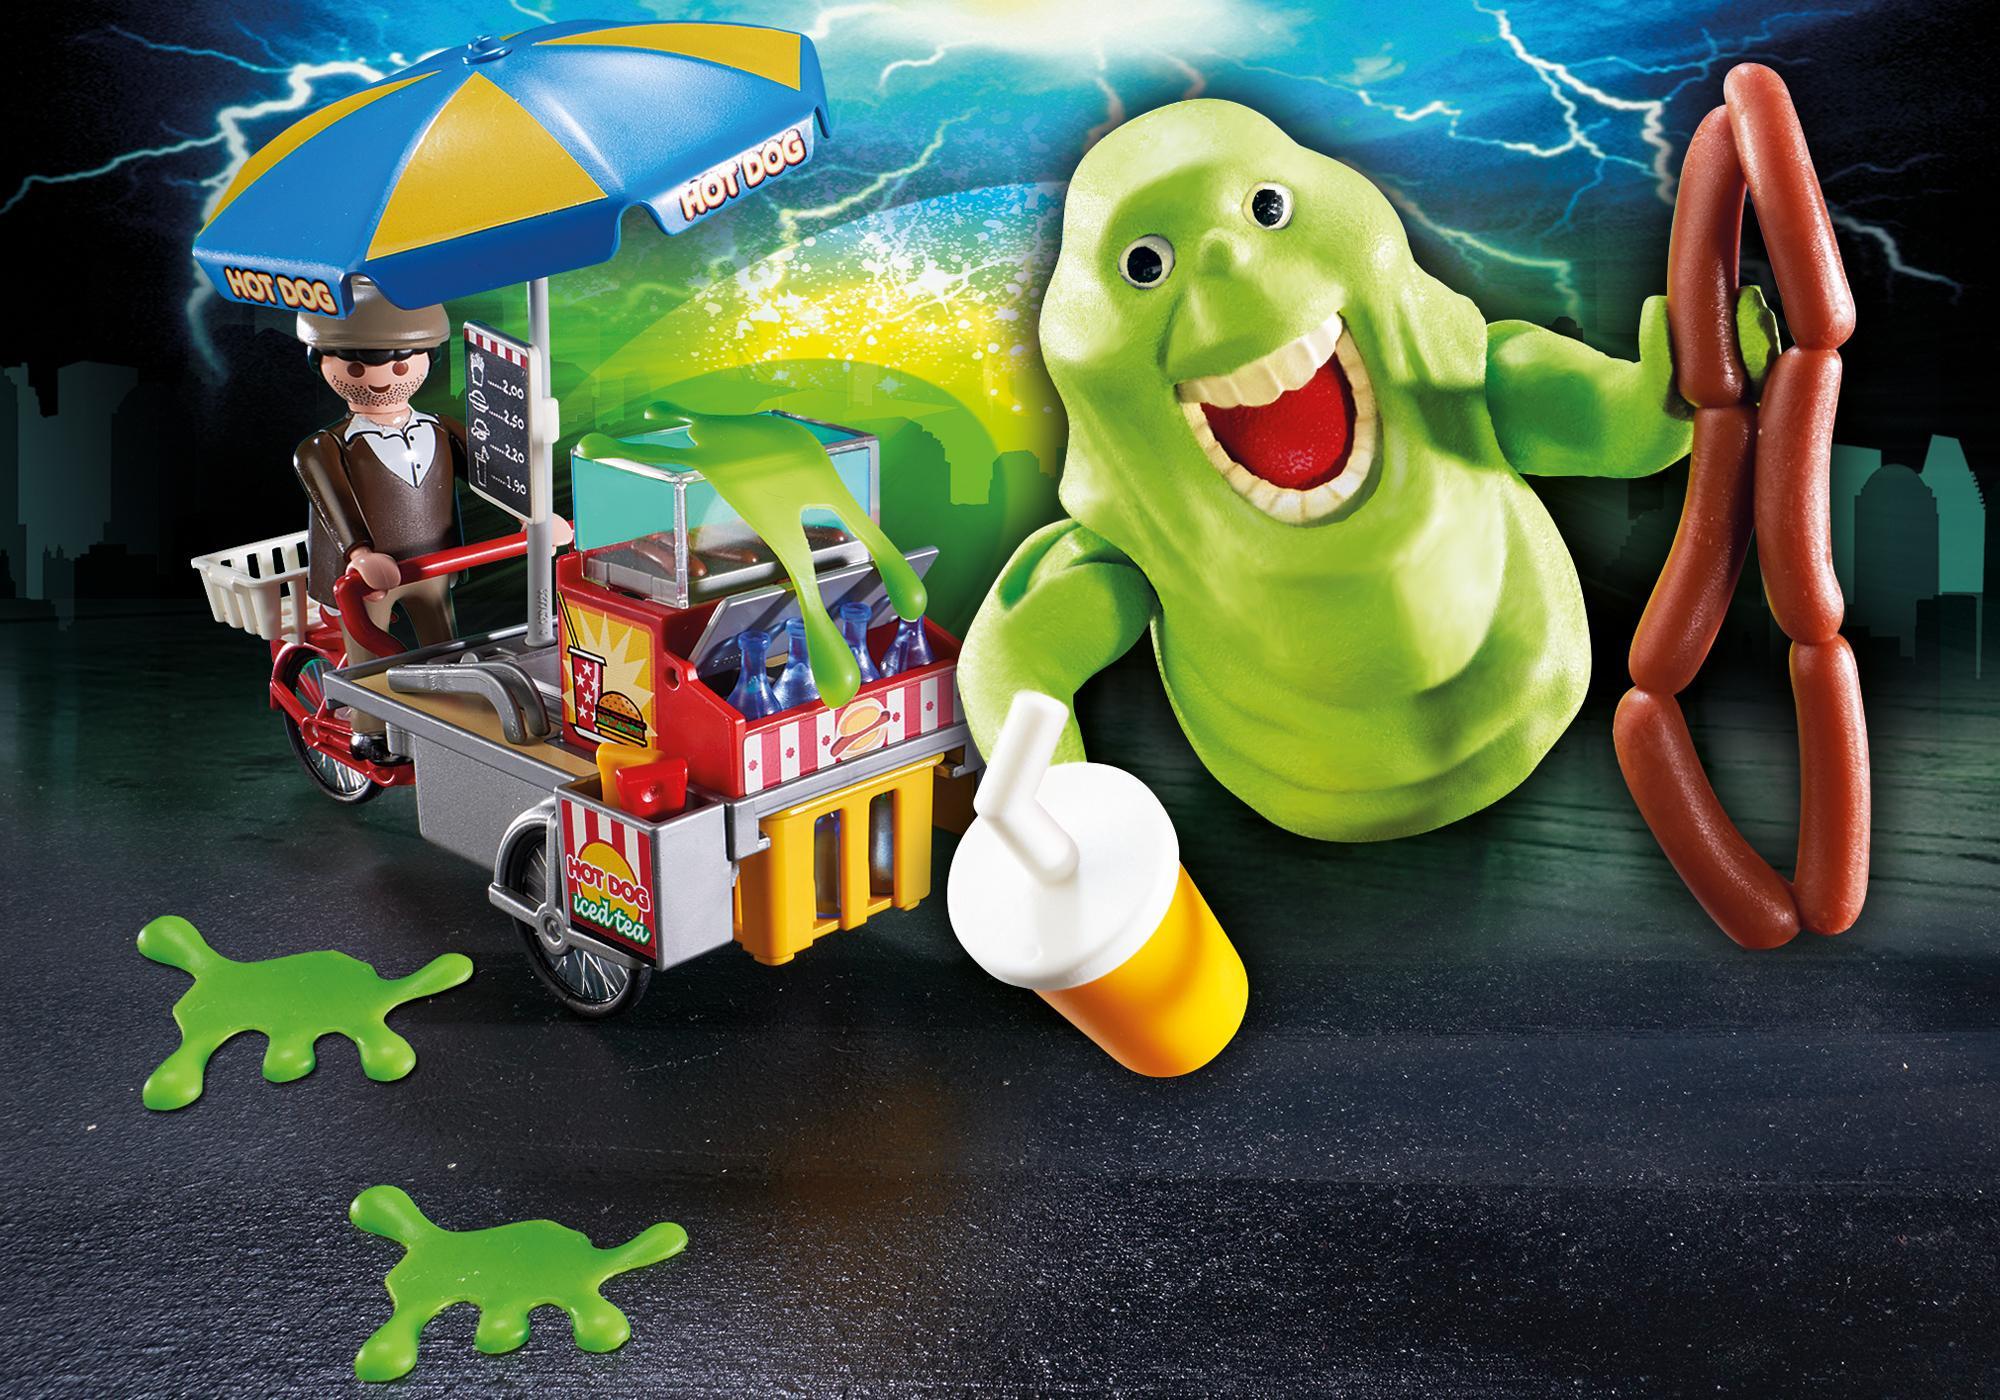 http://media.playmobil.com/i/playmobil/9222_product_extra1/Slimer mit Hot Dog Stand